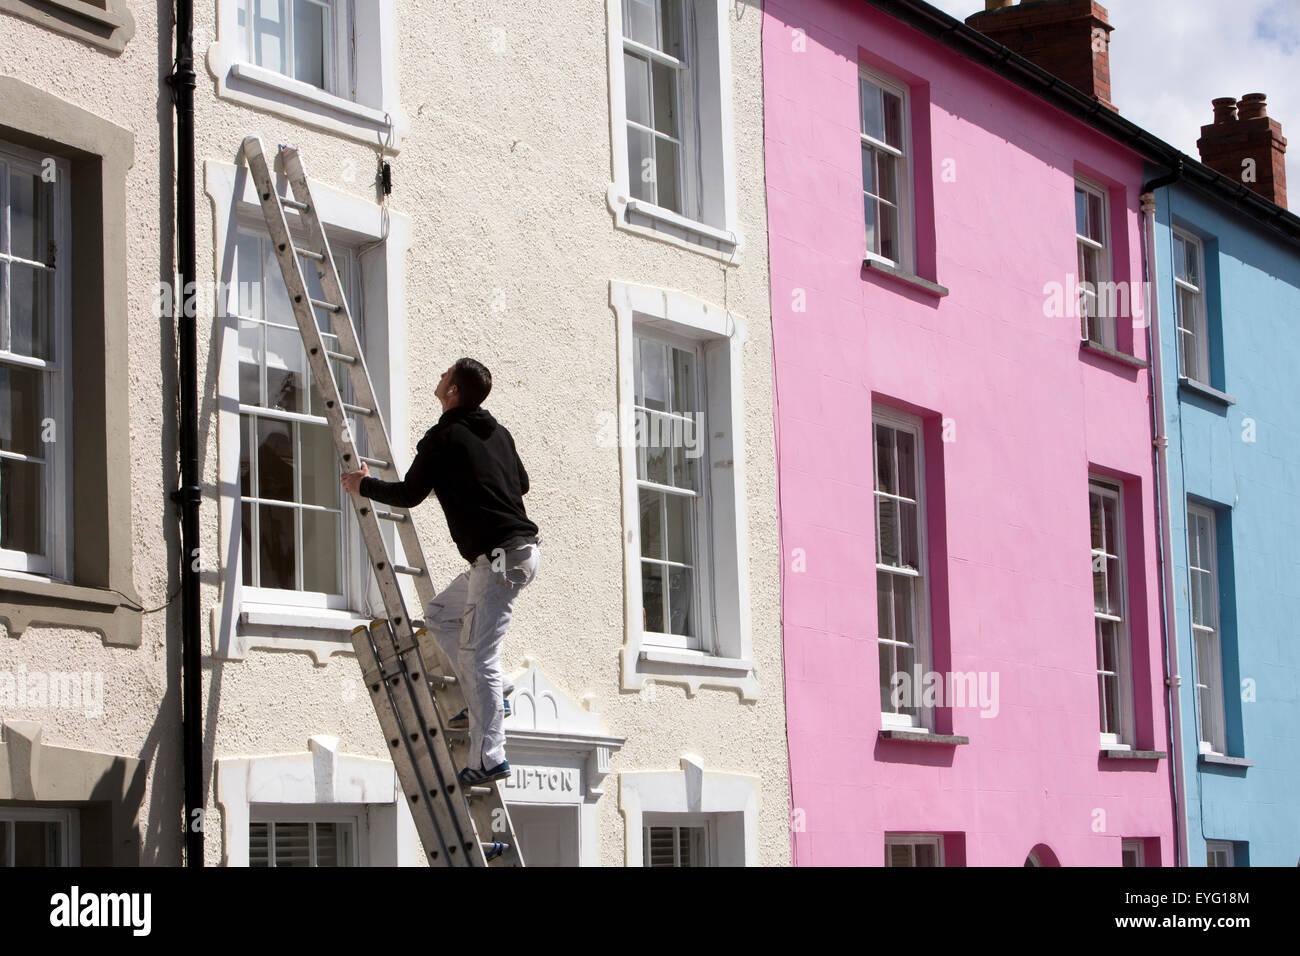 Man Painting House Uk Stock Photos & Man Painting House Uk Stock ...